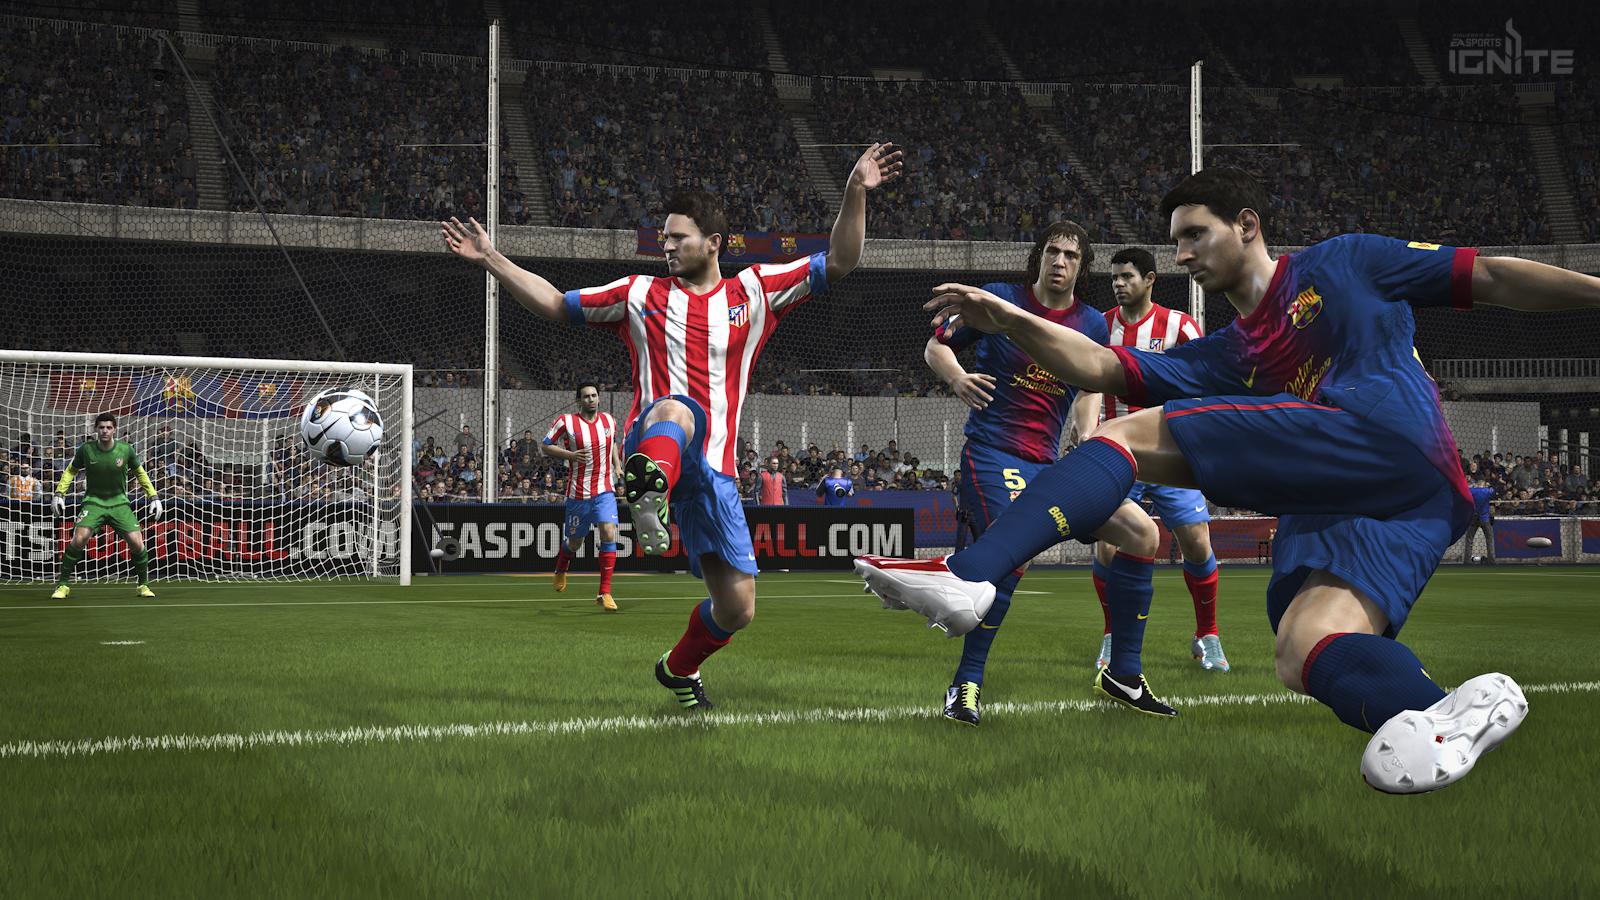 FIFA 14 | Messi Shooting on Next Gen